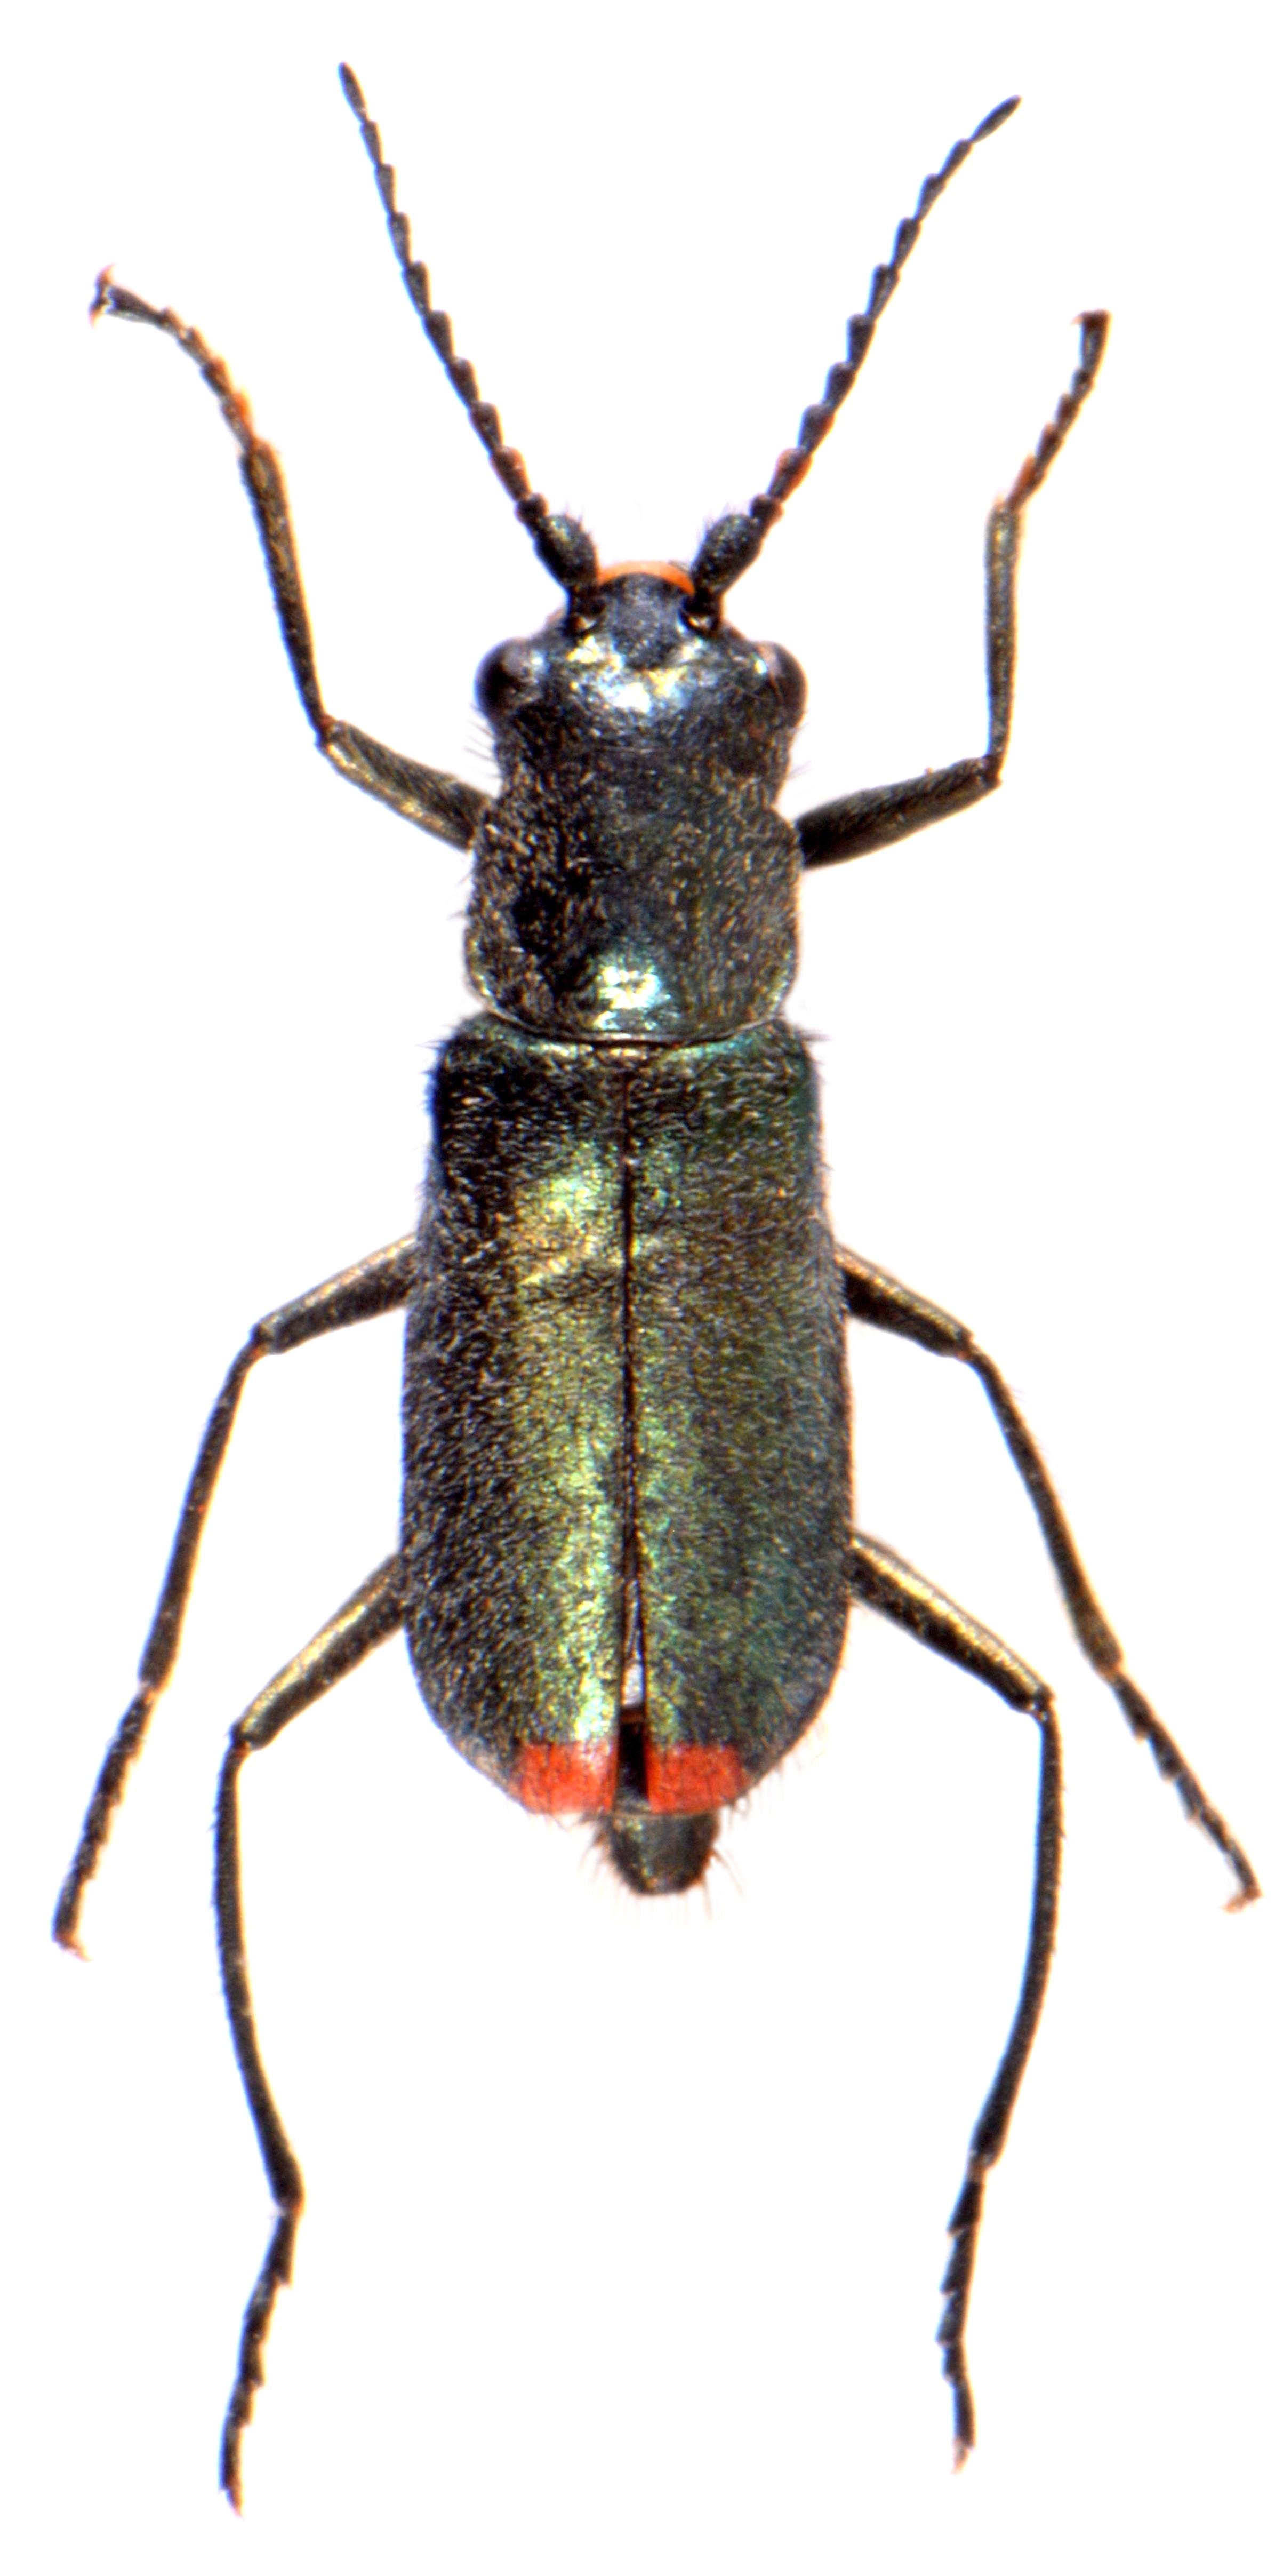 Cordylepherus viridis